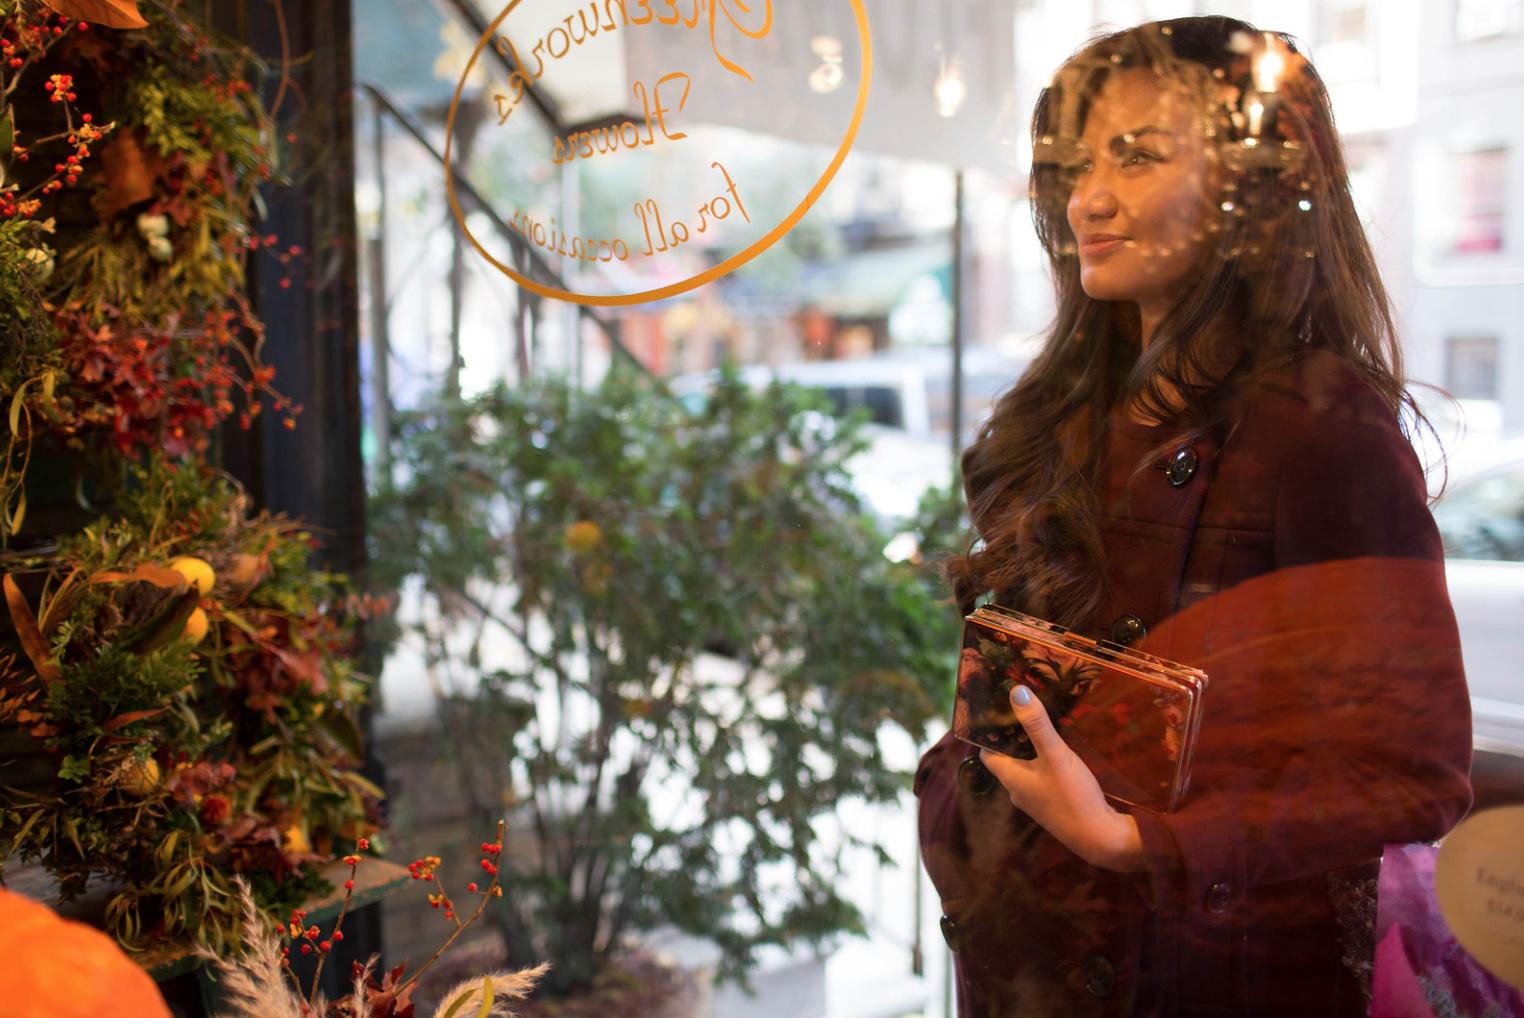 Burgundy Burberry Winter Coat New York Christmas with Caila Quinn